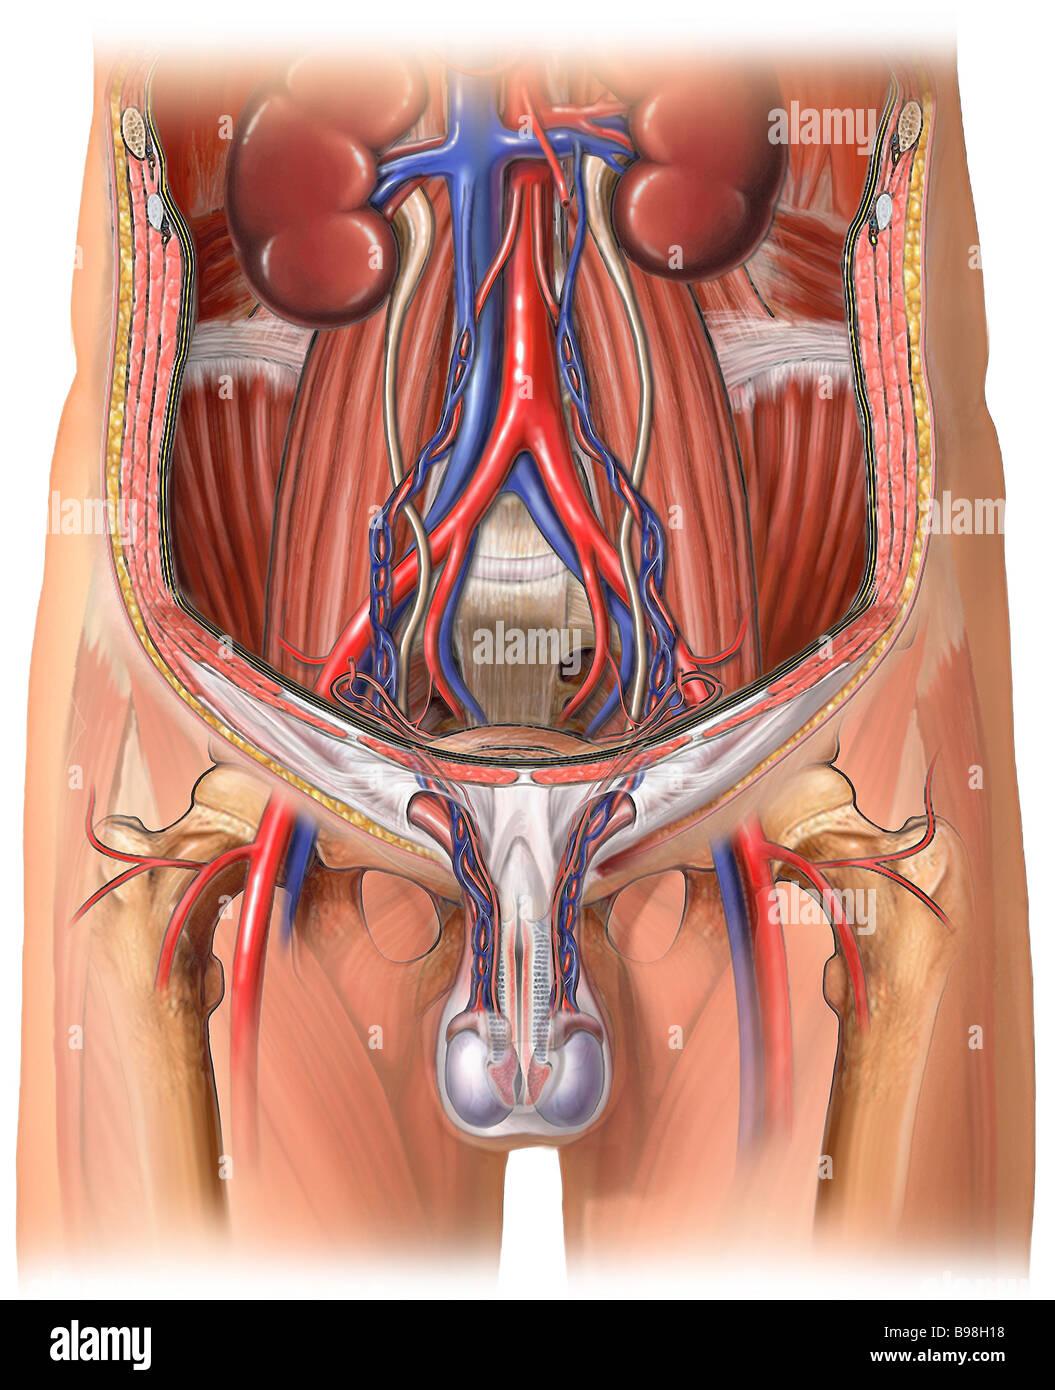 Testicular Blood Supply Stock Photo: 22931252 - Alamy